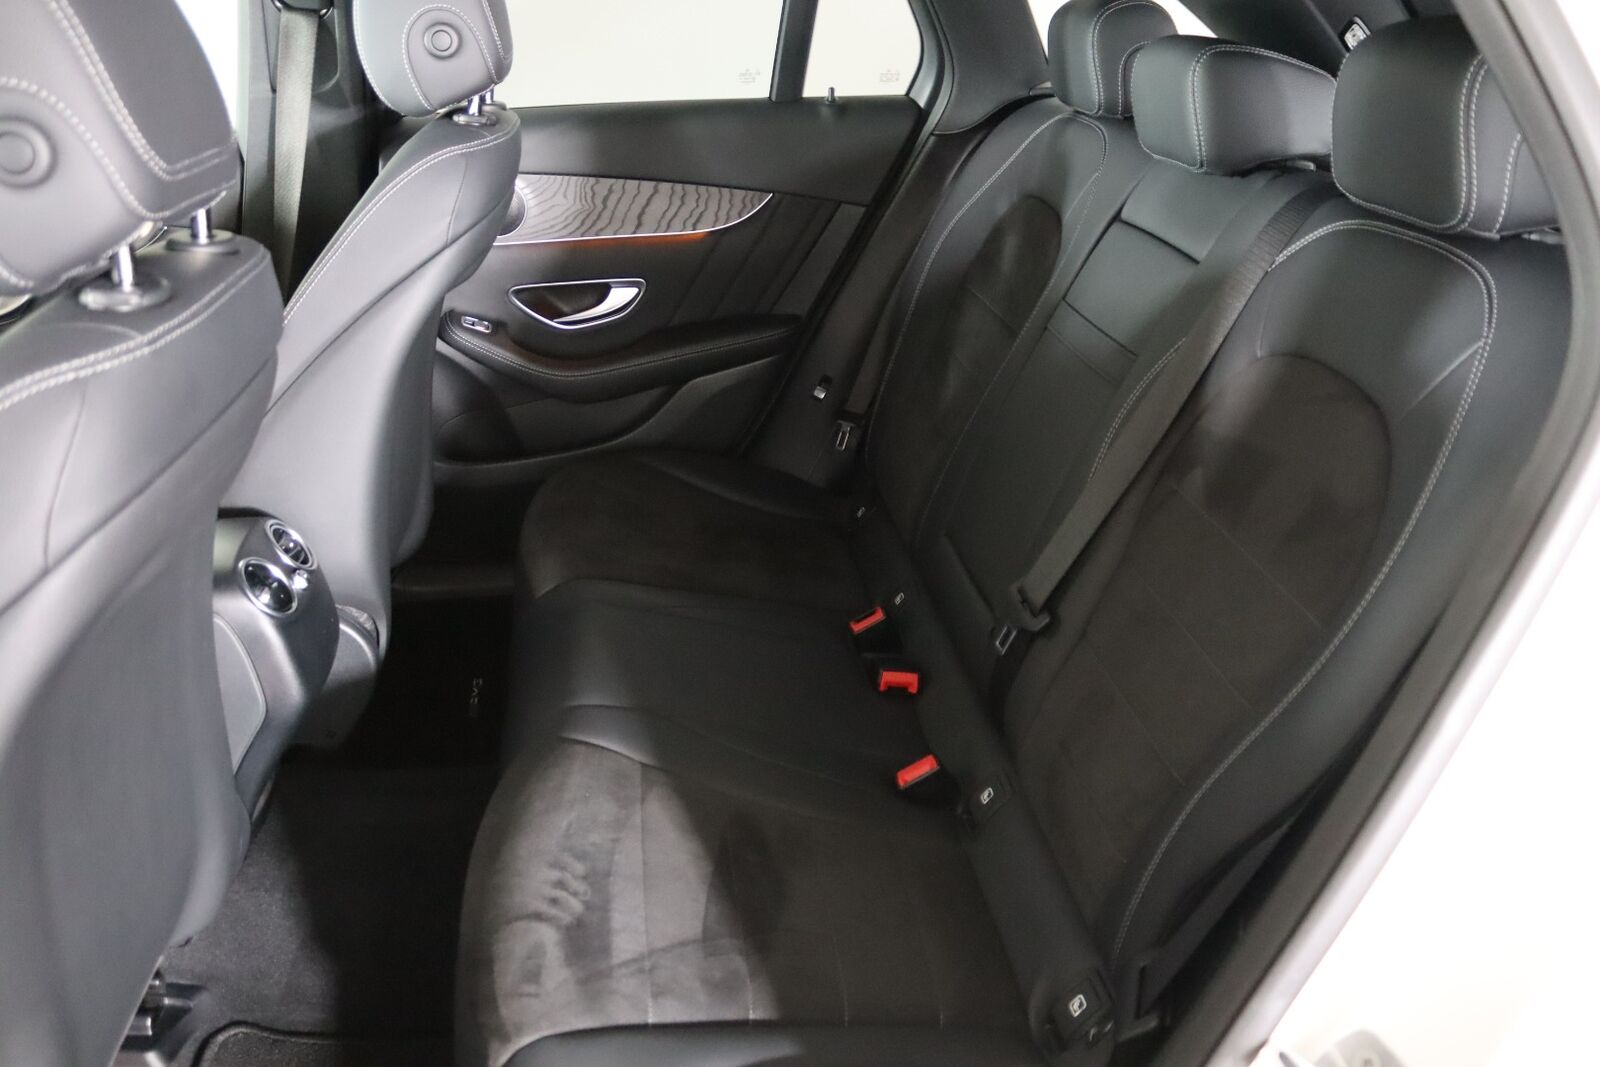 Mercedes GLC350 d 3,0 AMG Line aut. 4Matic - billede 6